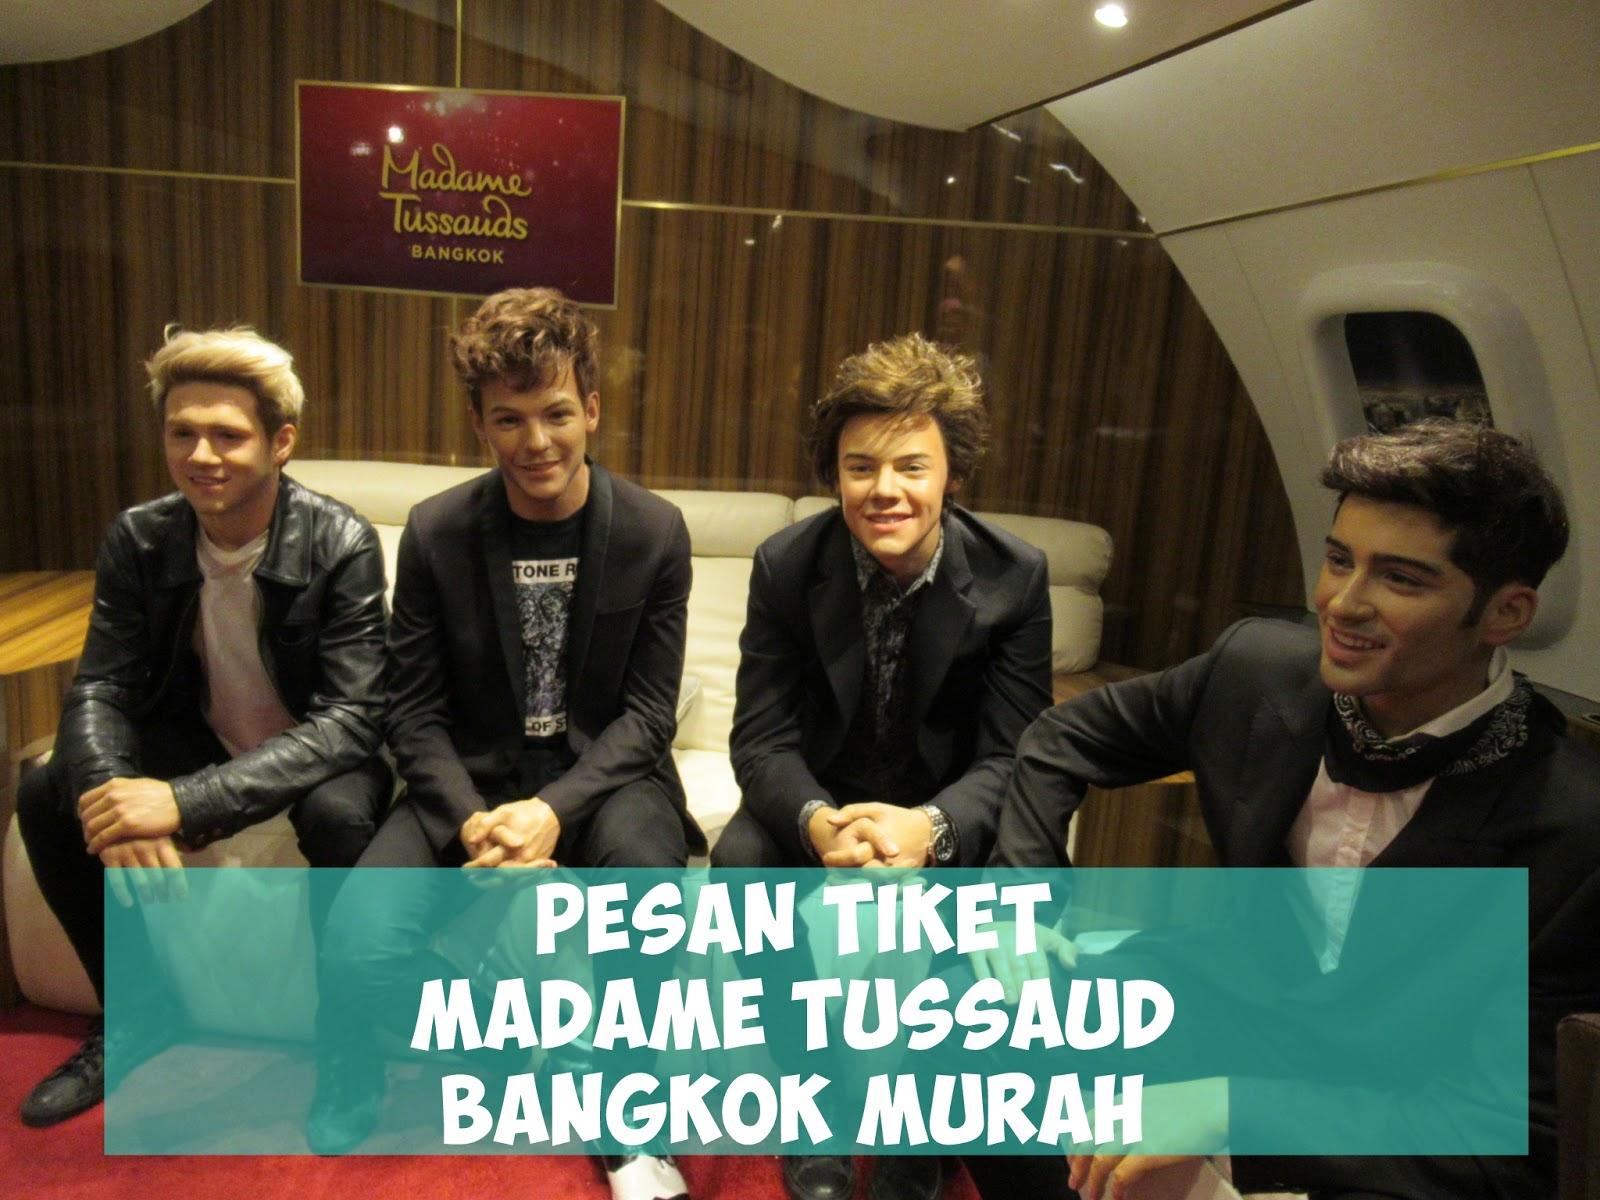 Daftar Harga Tiket Madame Tussauds Singapore Terbaru 2018 Snow City Atraksi Liburan Murah Bangkok Pattaya Huahin Asisten Jual Tussaud